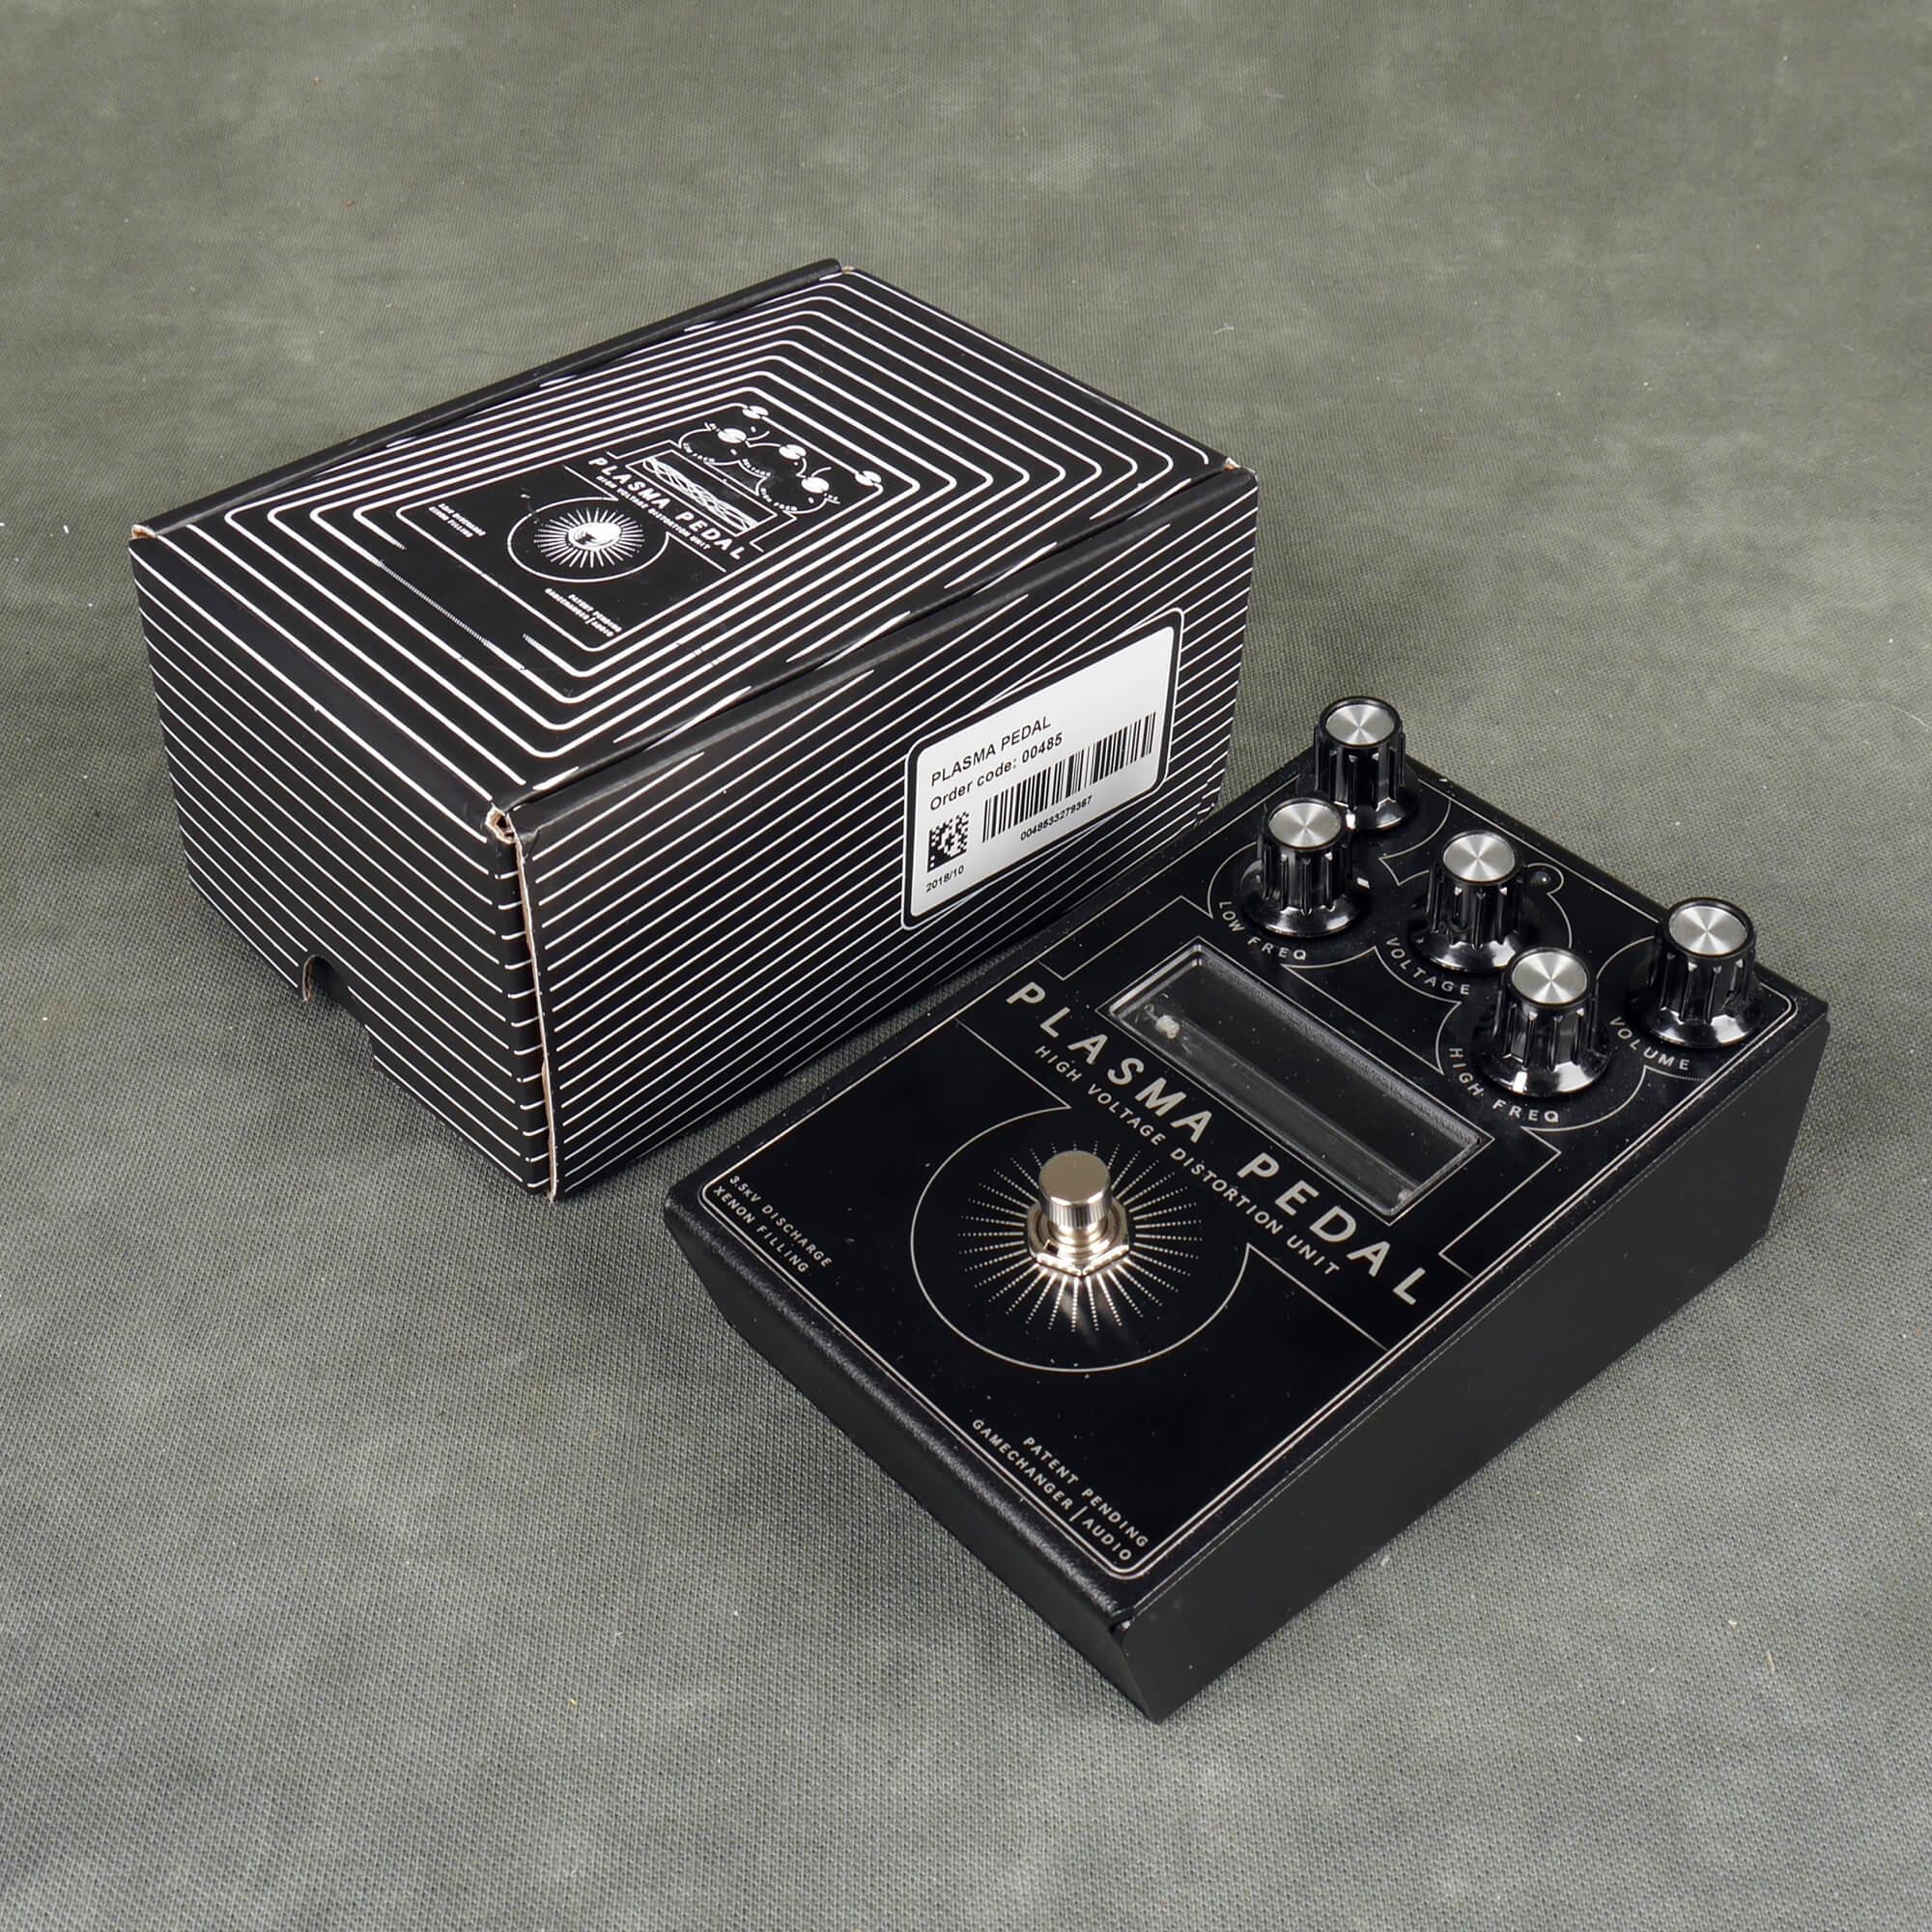 Gamechanger Audio Plasma Pedal High Voltage Distortion Unit w/Box - 2nd Hand